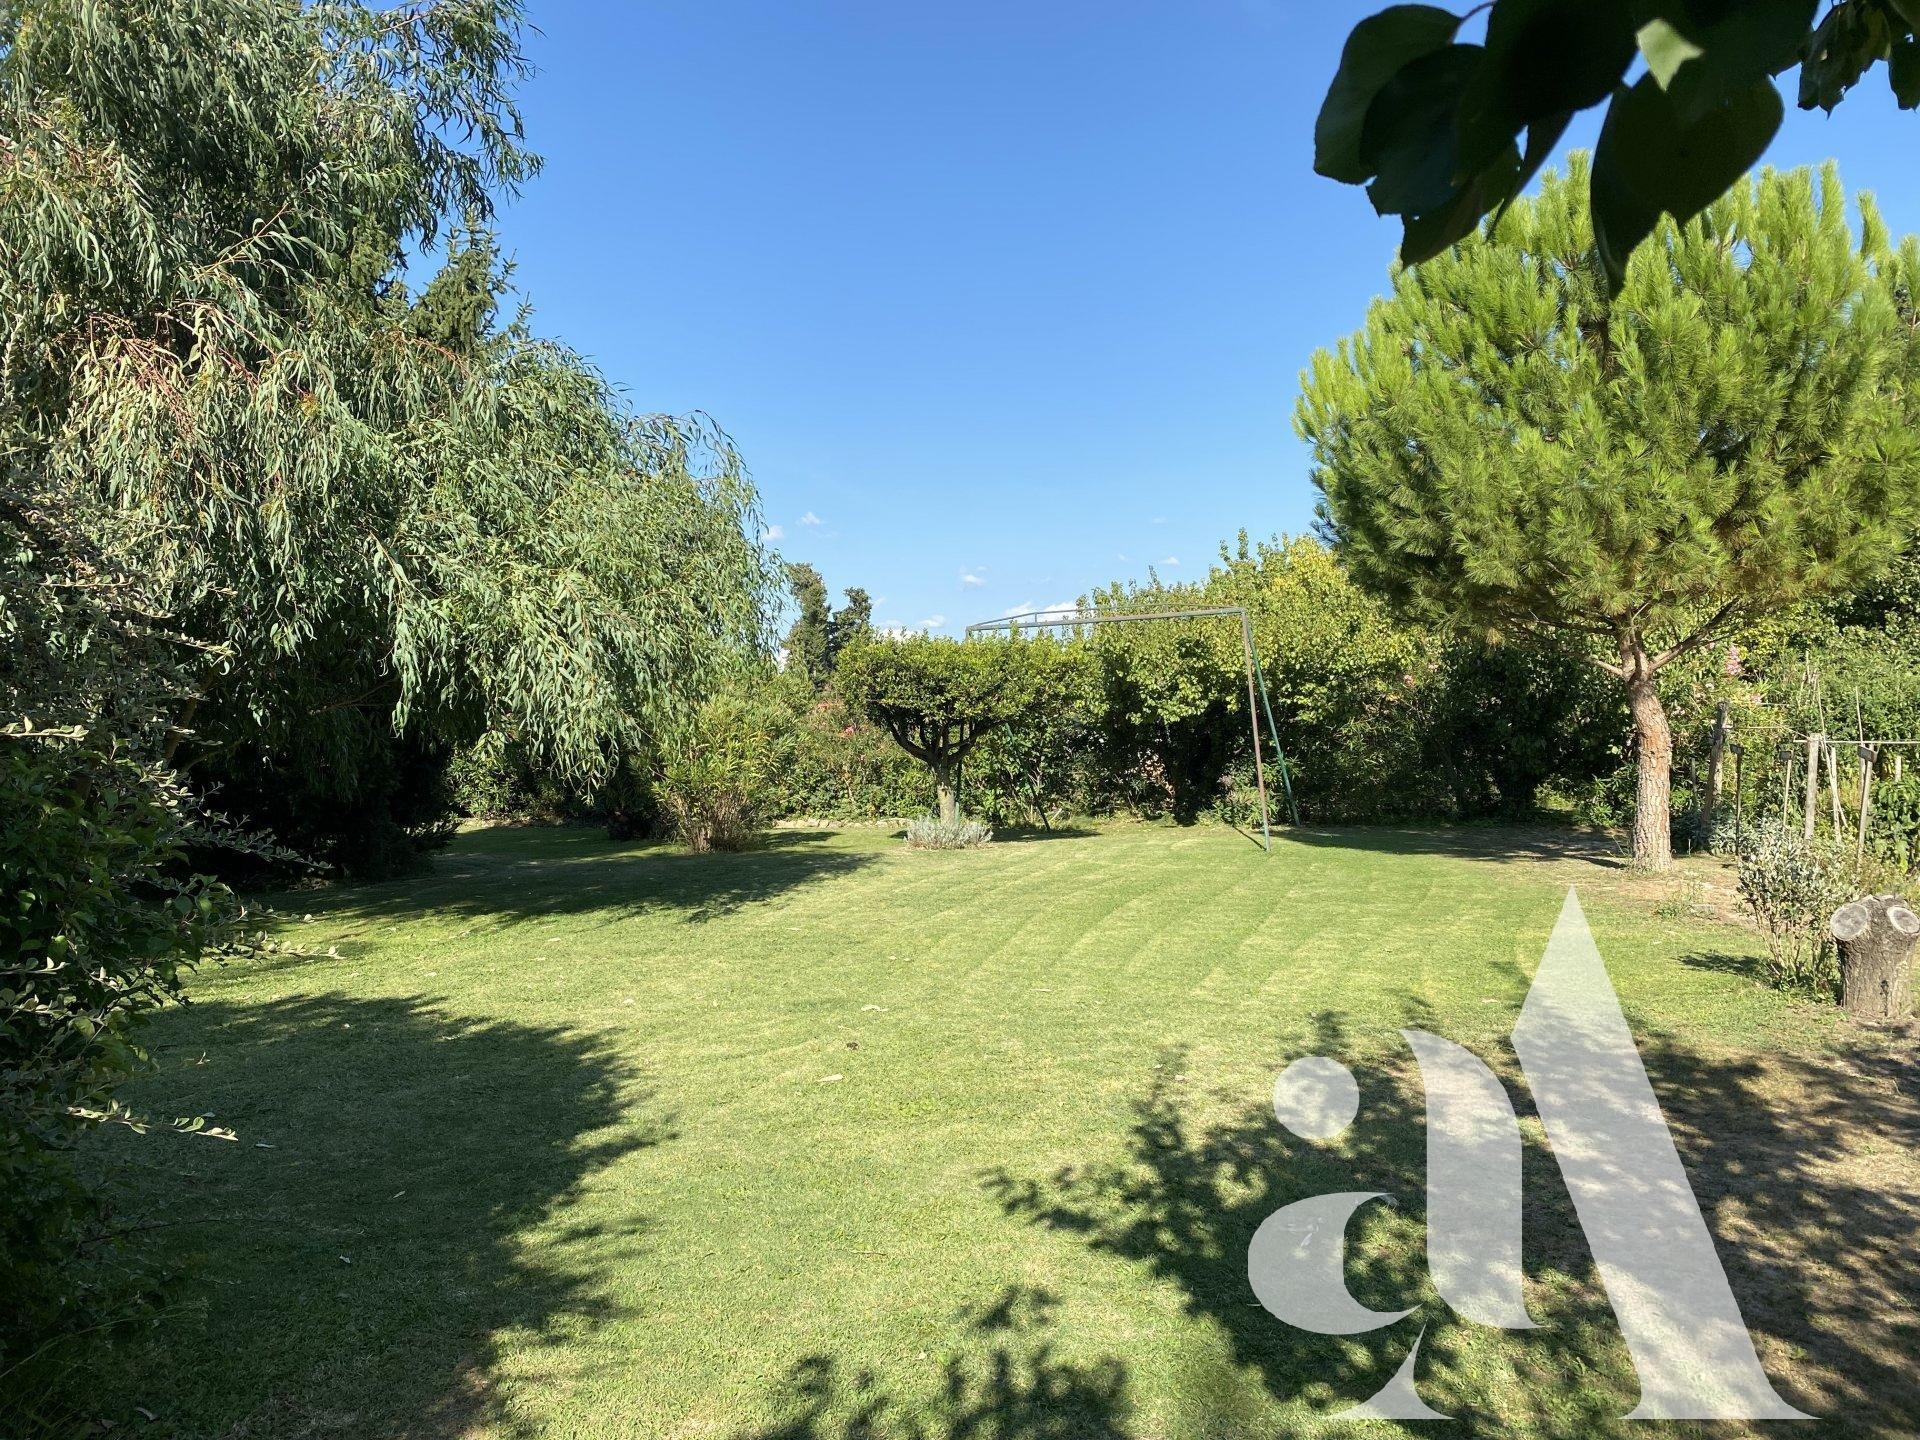 VILLA CASSIOPEE - CHATEAURENARD - PROVENCE - 5 chambres - 12 personnes